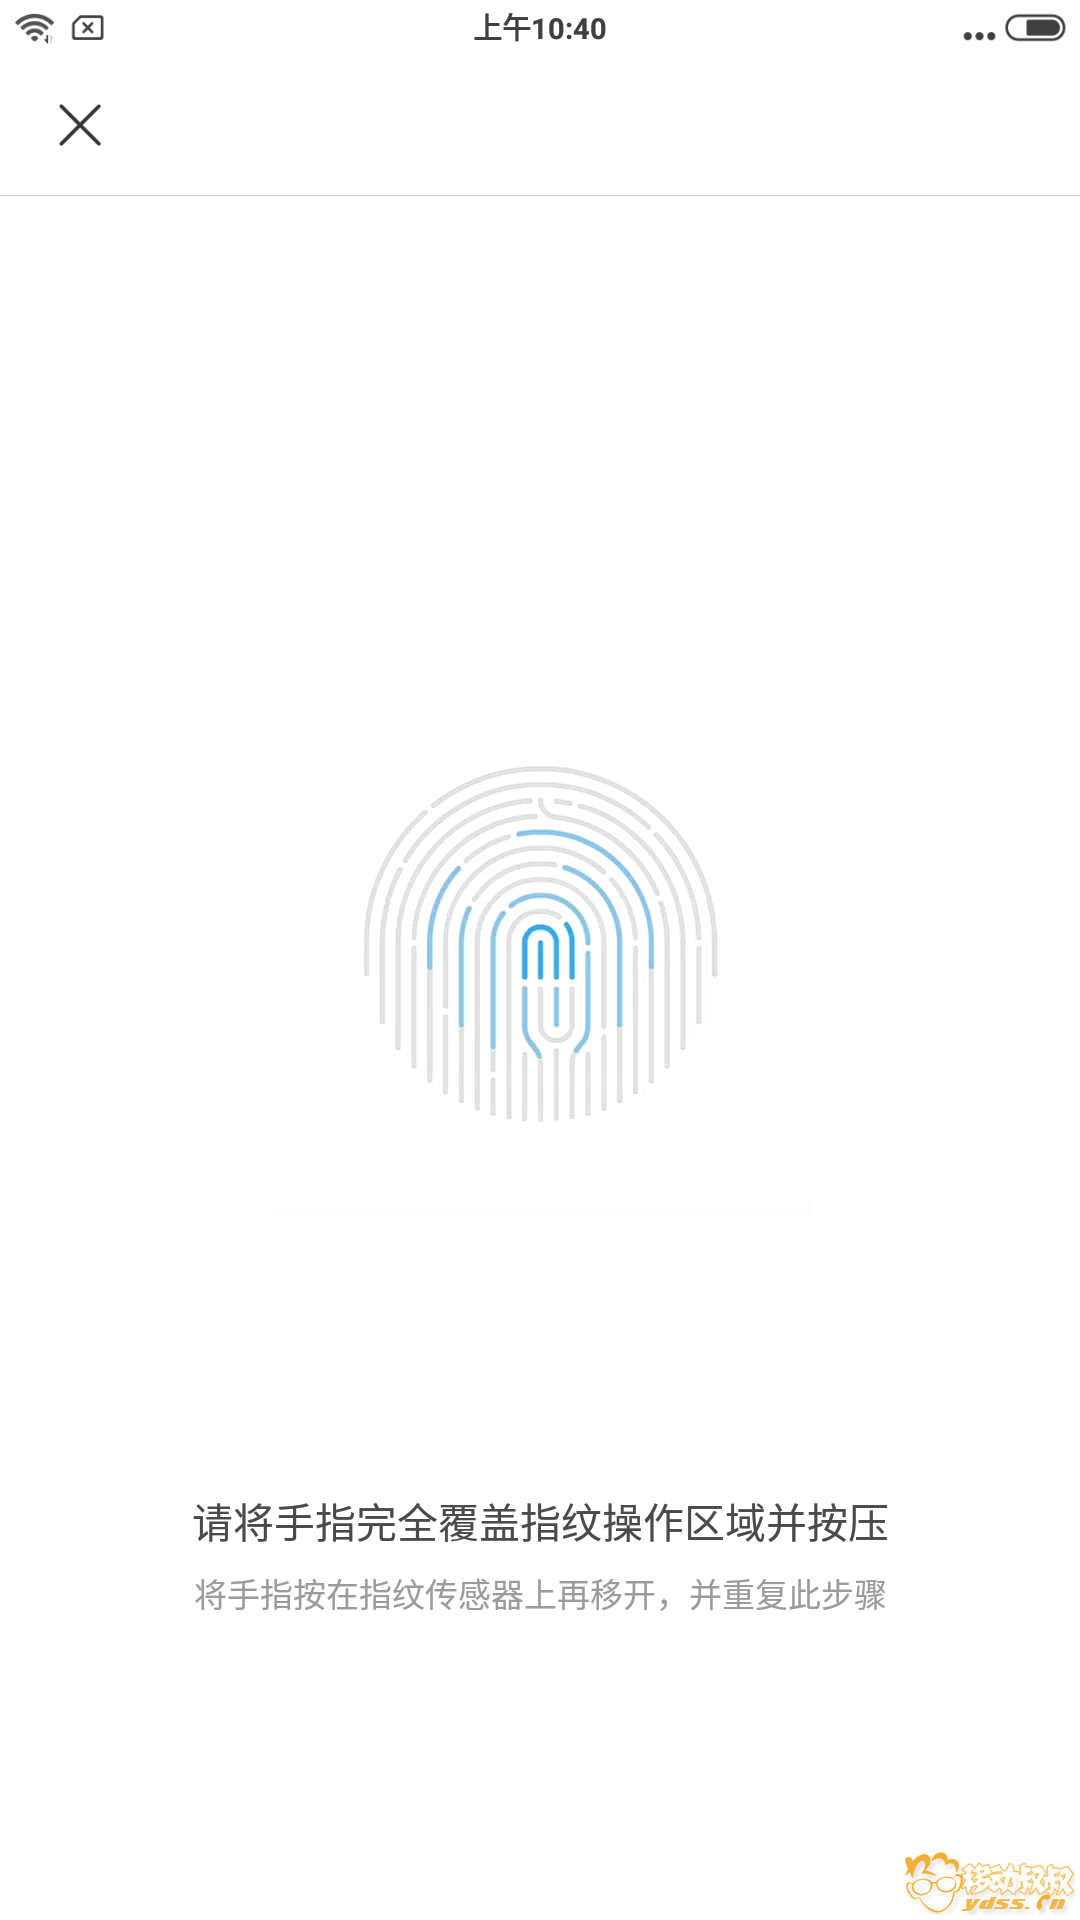 Screenshot_2018-08-10-10-40-54-570_com.android.settings.png